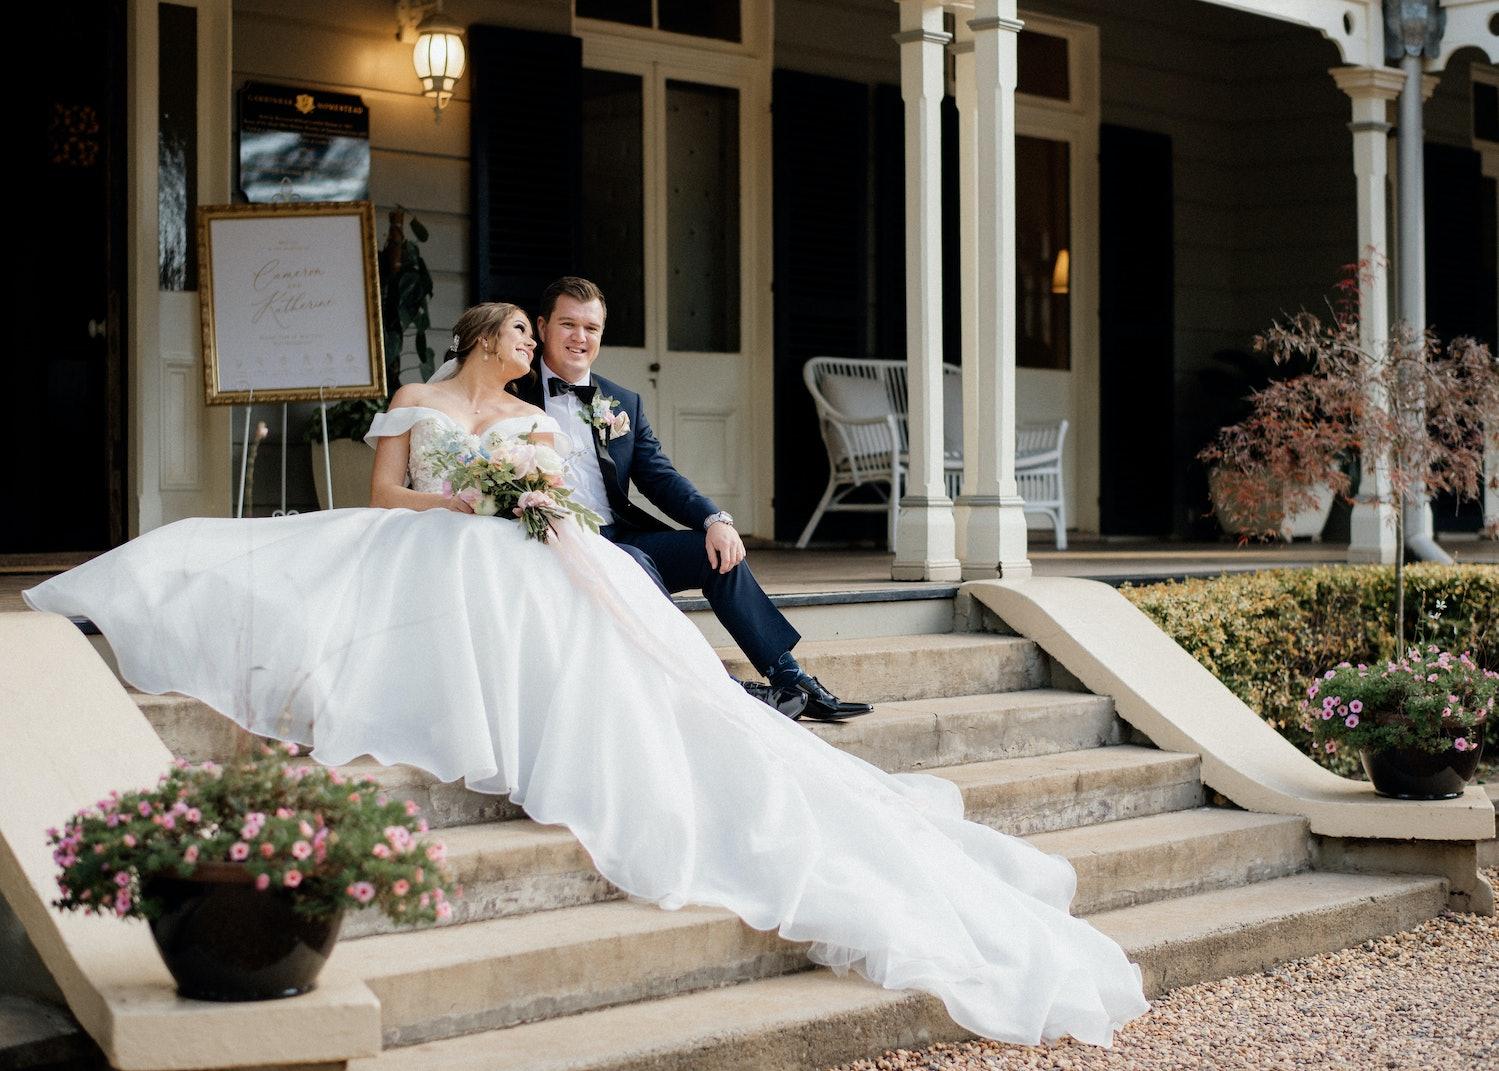 Bride and groom sitting on steps